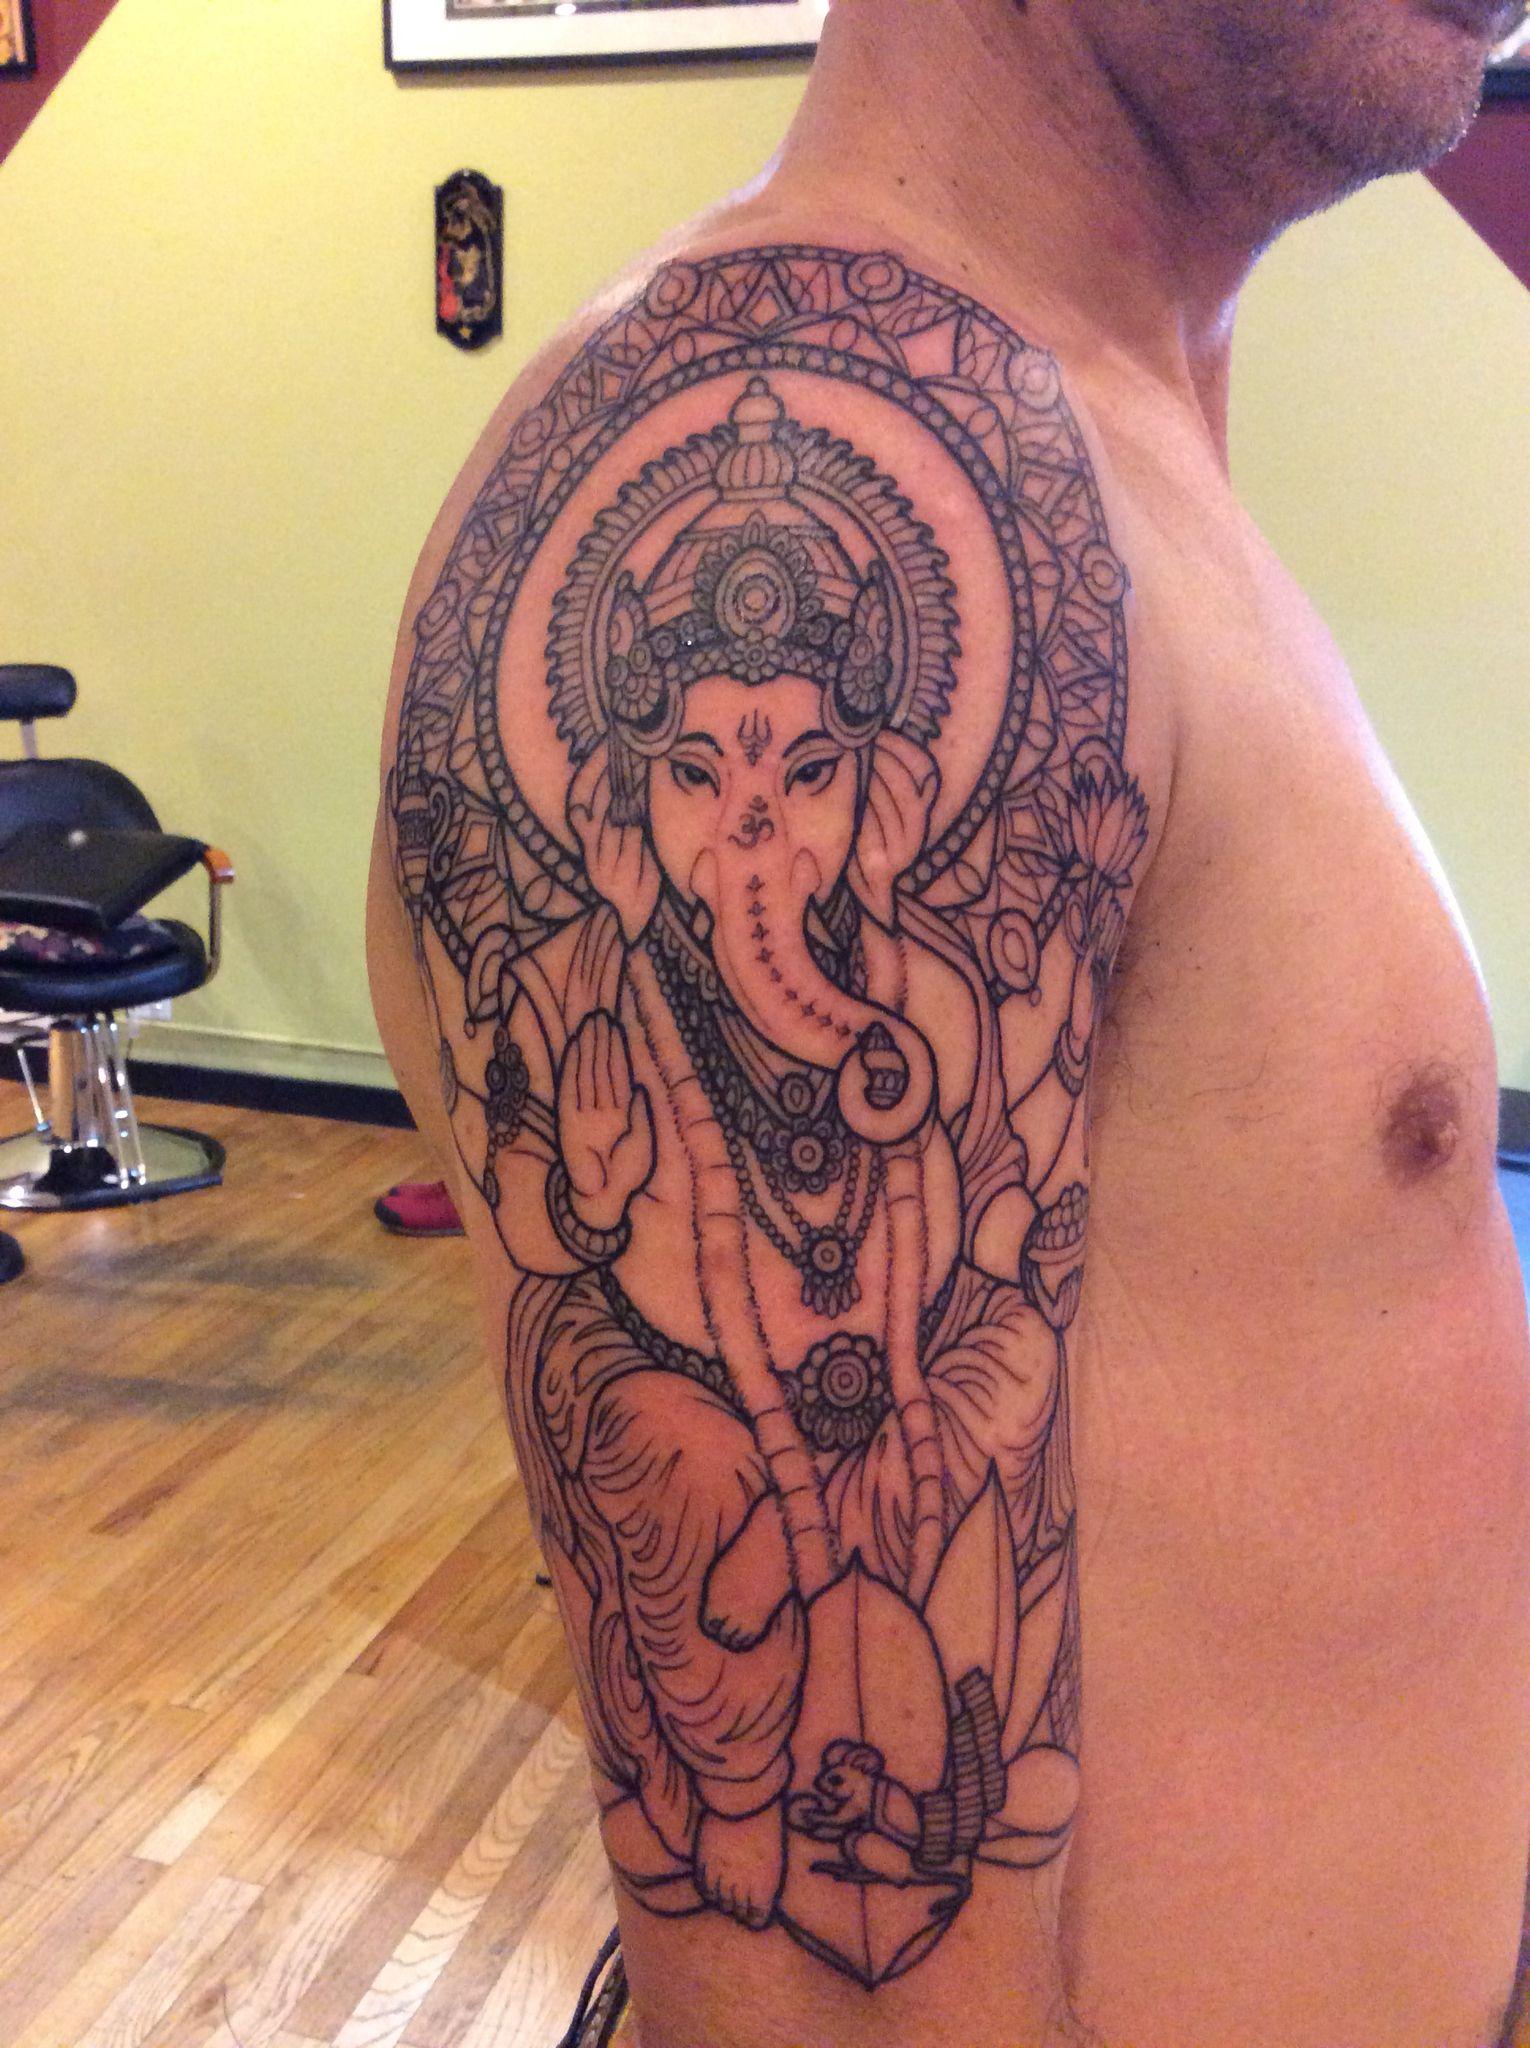 11 ganesha tattoo designs ideas and samples - Ganesha Tattoo By Tattoo S By Heidi In Seattle